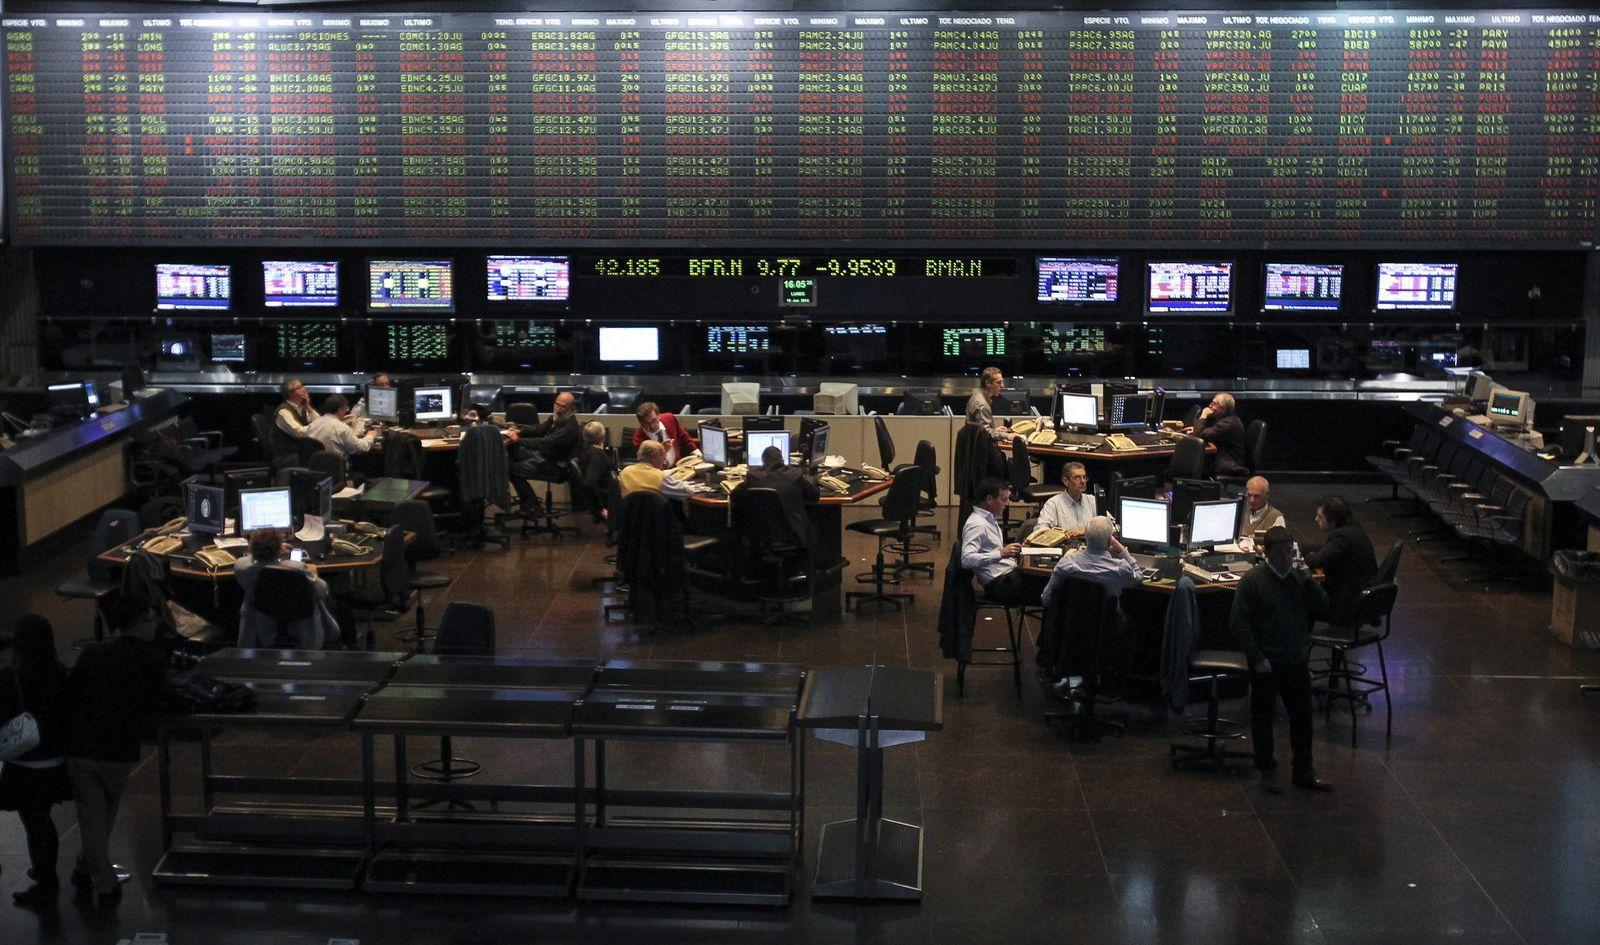 BUENOS AIRES STOCK EXCHANGE COLLAPSES DUE TO US SUPREME VERDICT